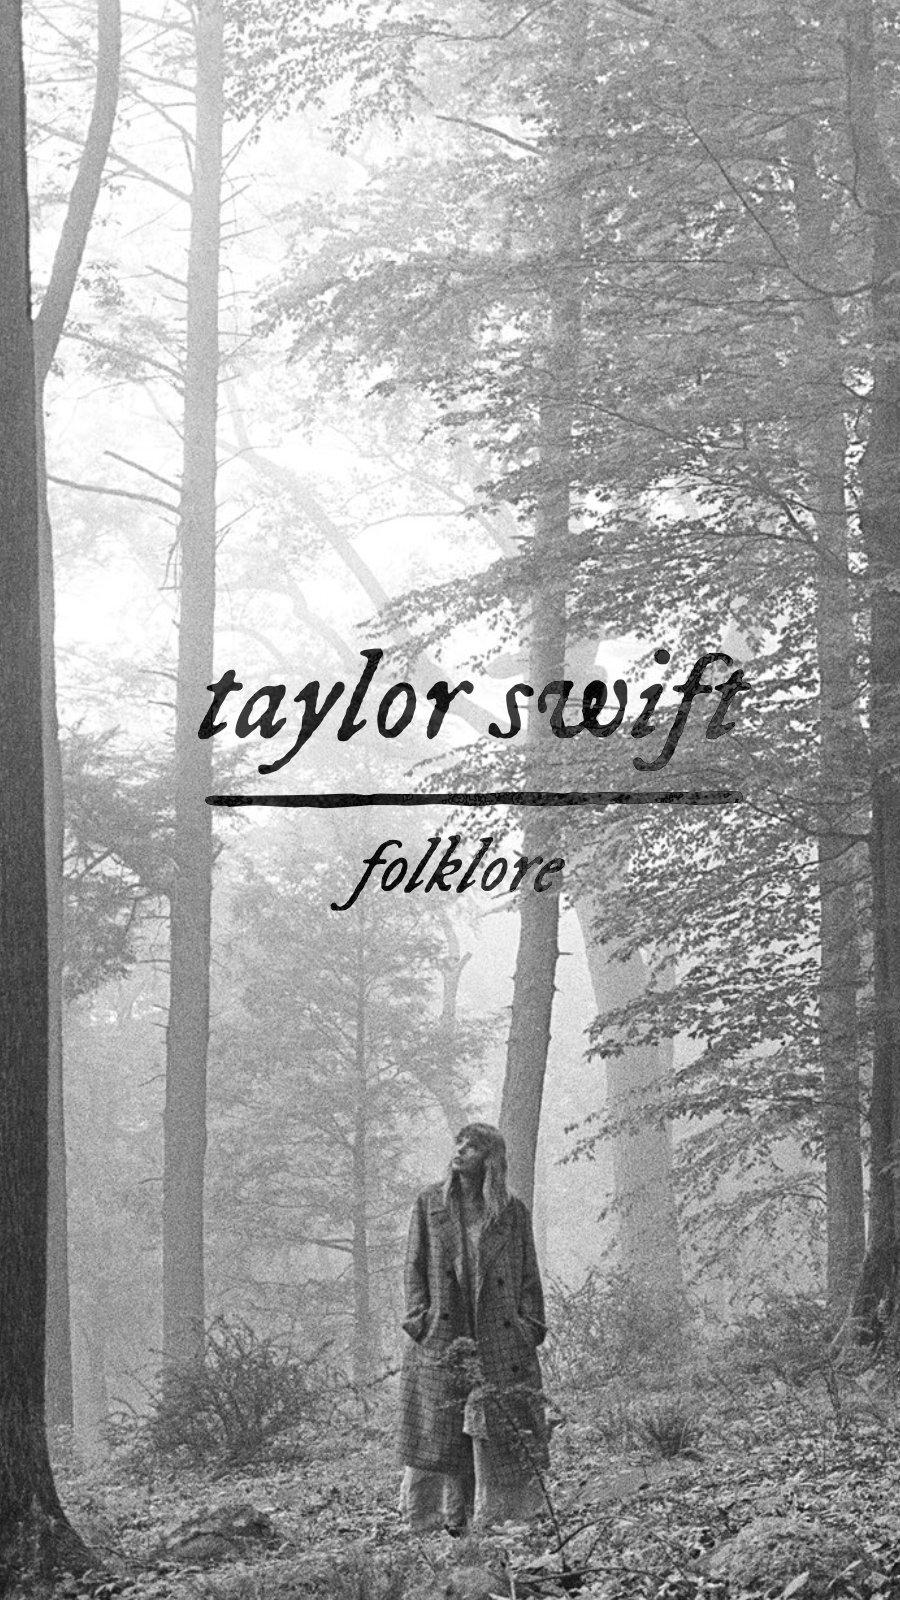 Fondos de pantalla Folklore de Taylor Swift Vertical